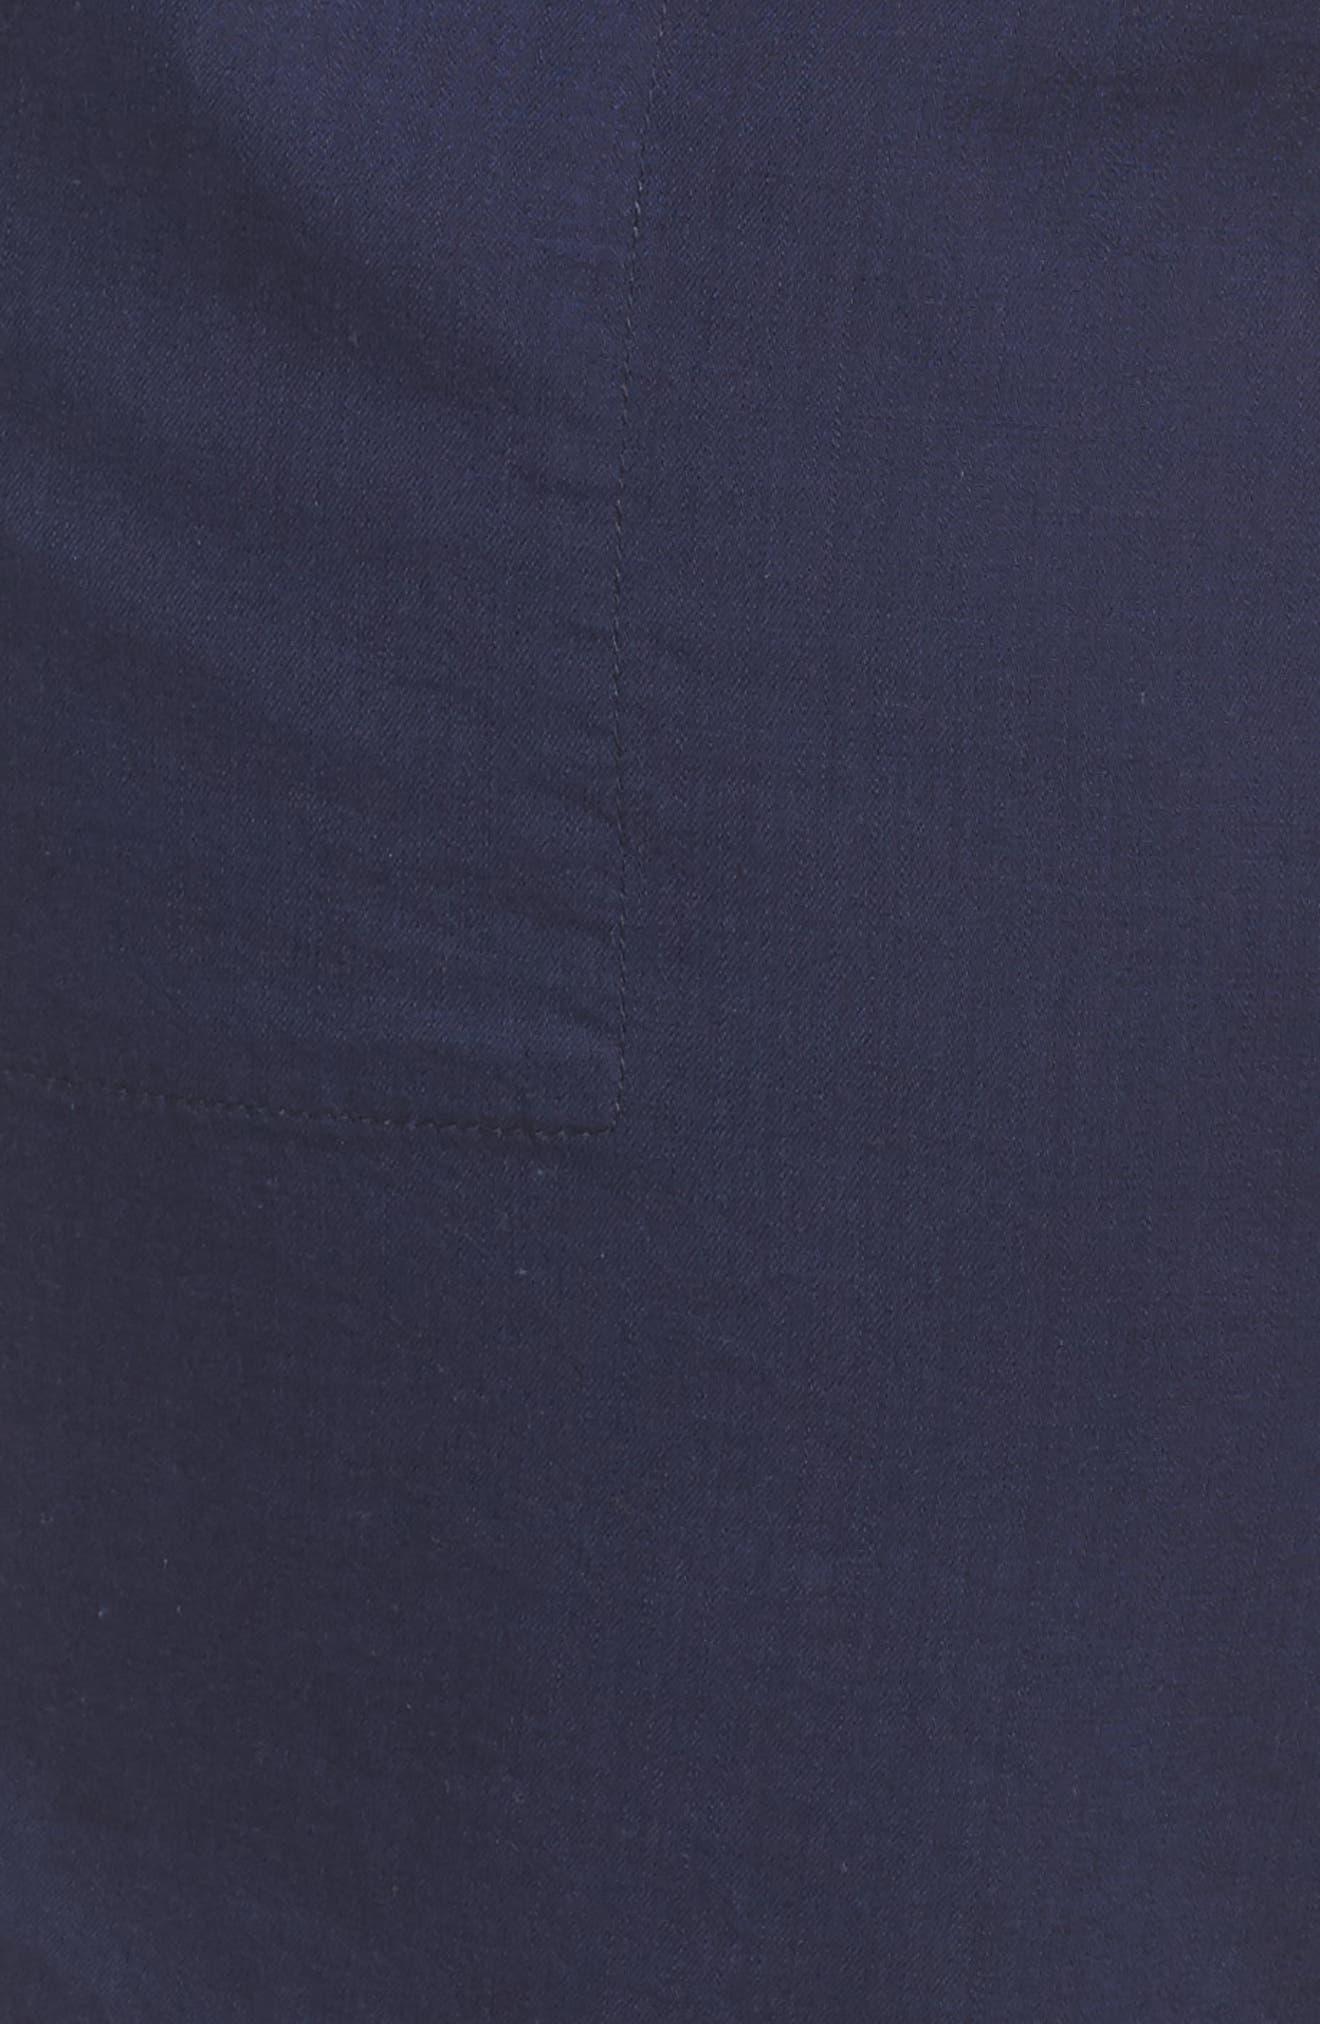 Pull-On Twill Shorts,                             Alternate thumbnail 6, color,                             NAVY PEACOAT